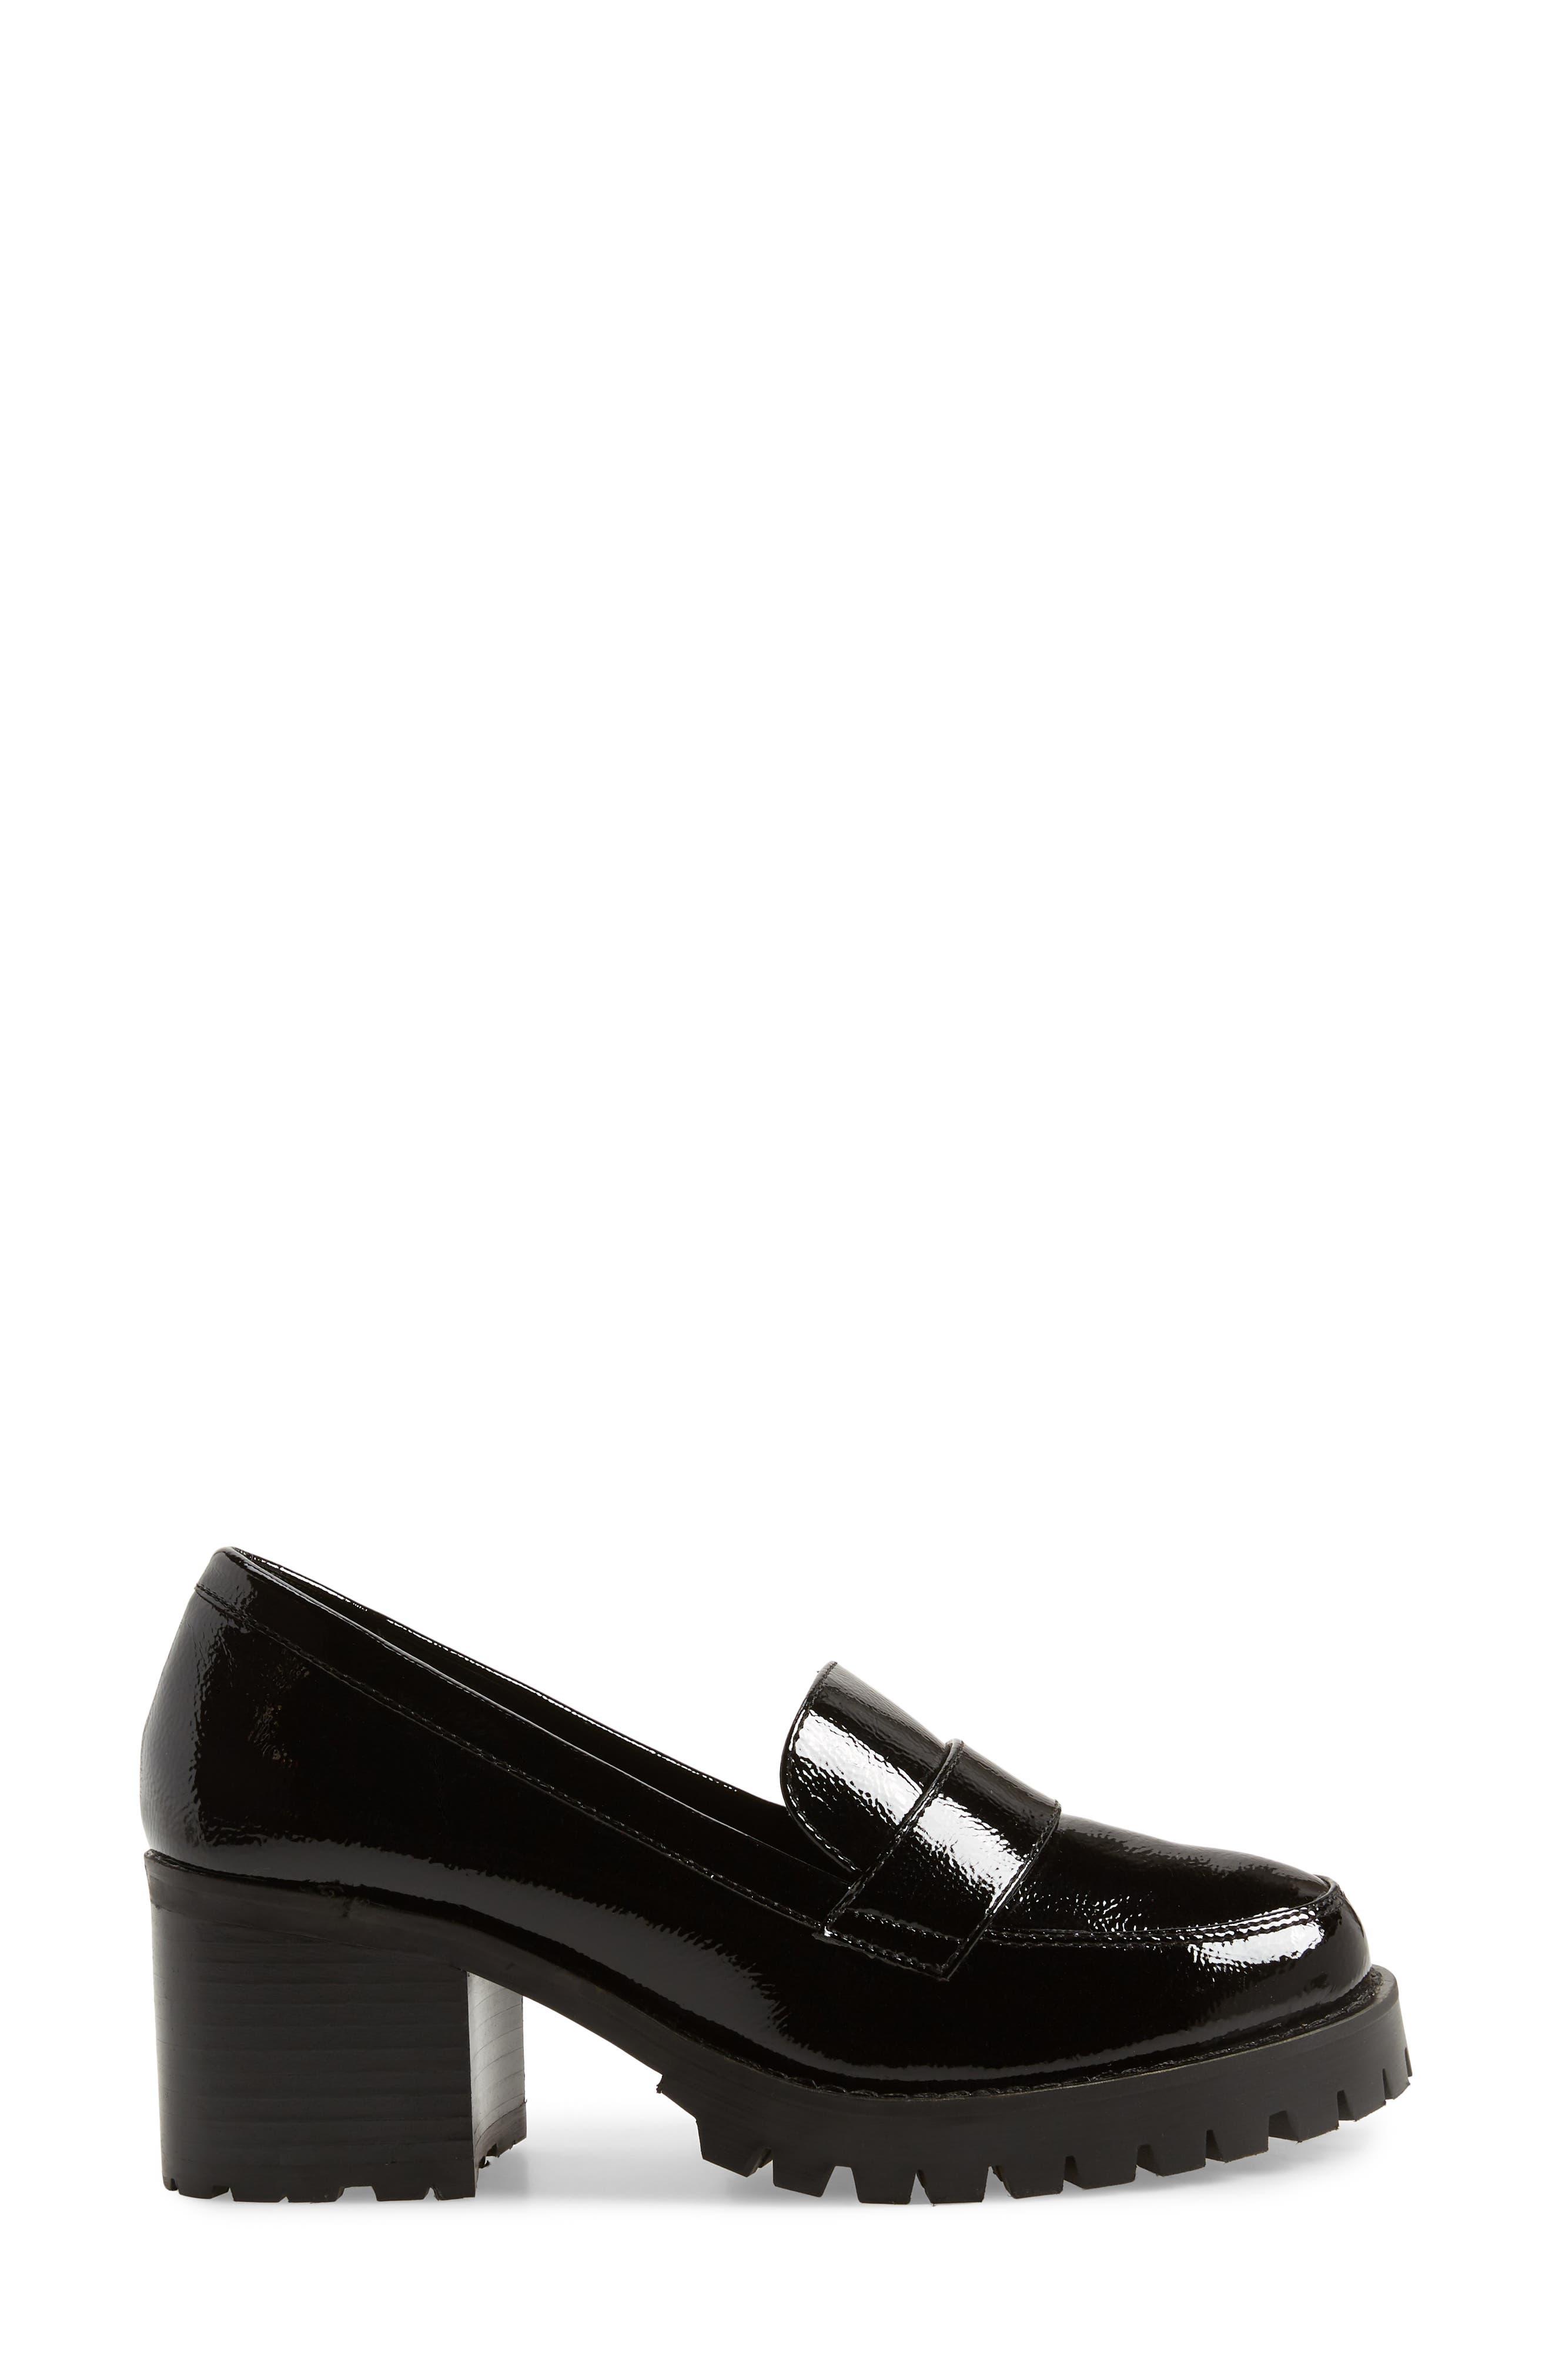 Leighton Platform Loafer,                             Alternate thumbnail 3, color,                             BLACK